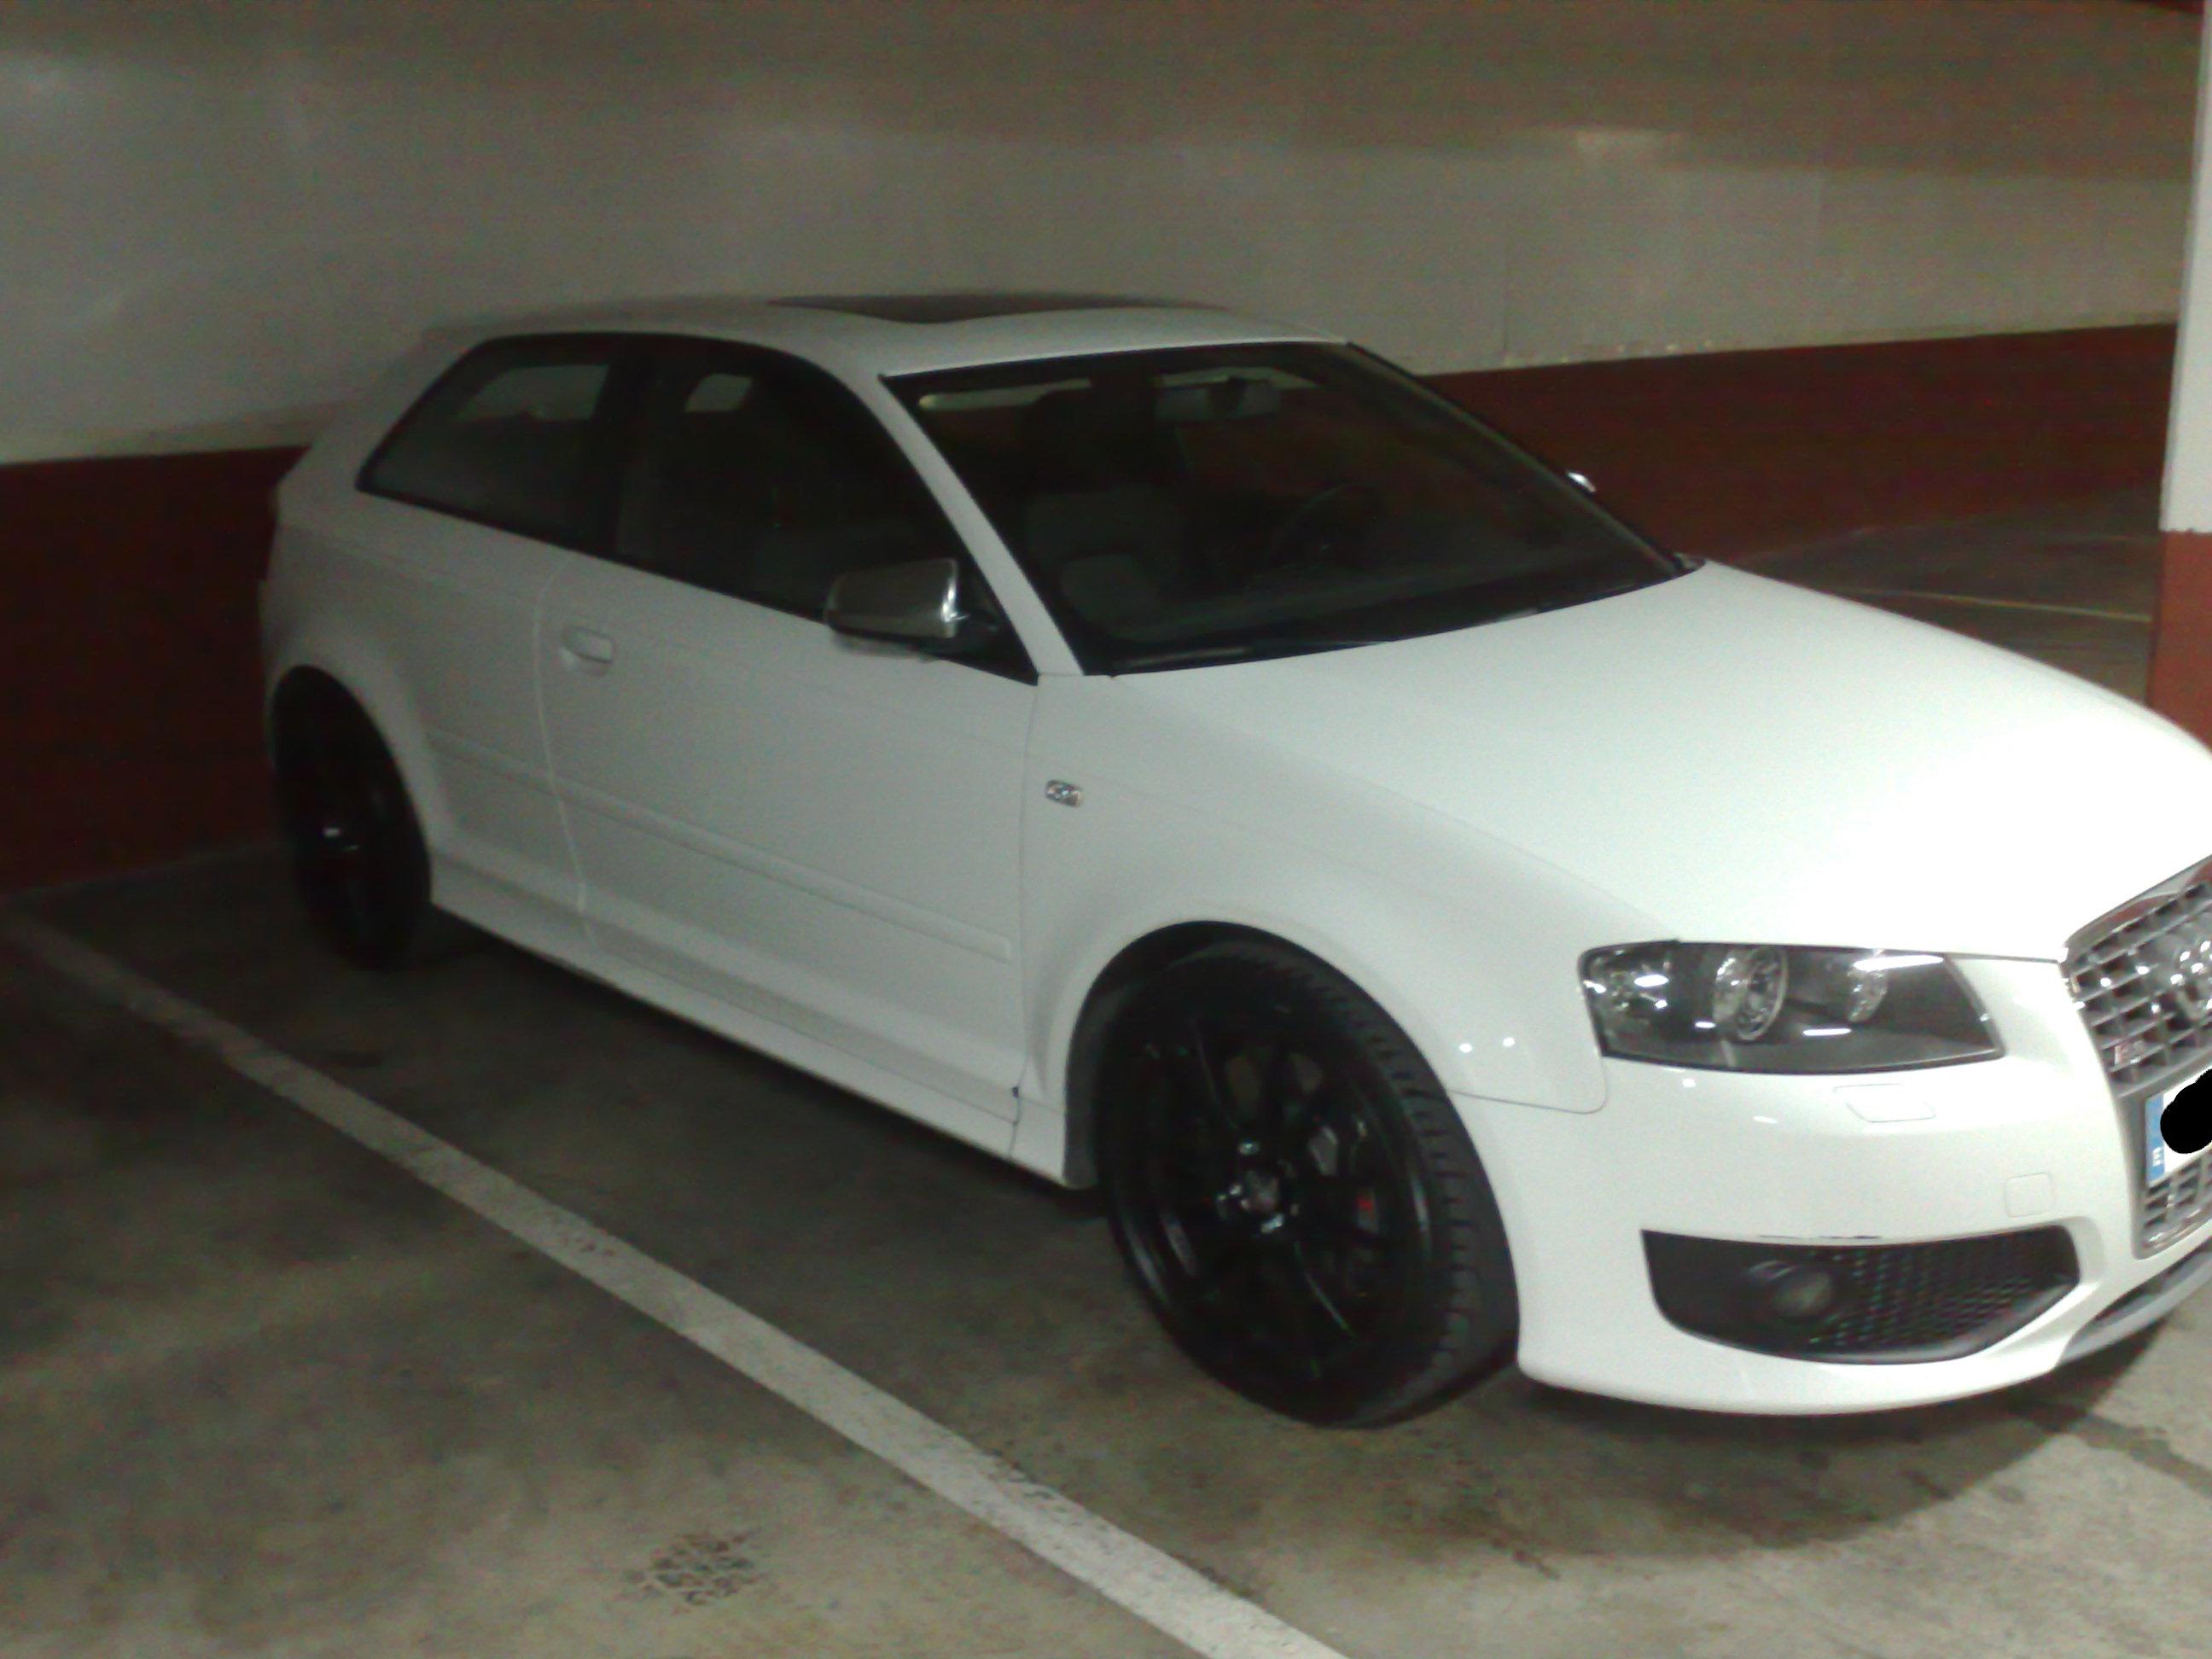 Mi S3 Blanco Con Llantas Oz Negras Audi S R Rs Audisport Iberica